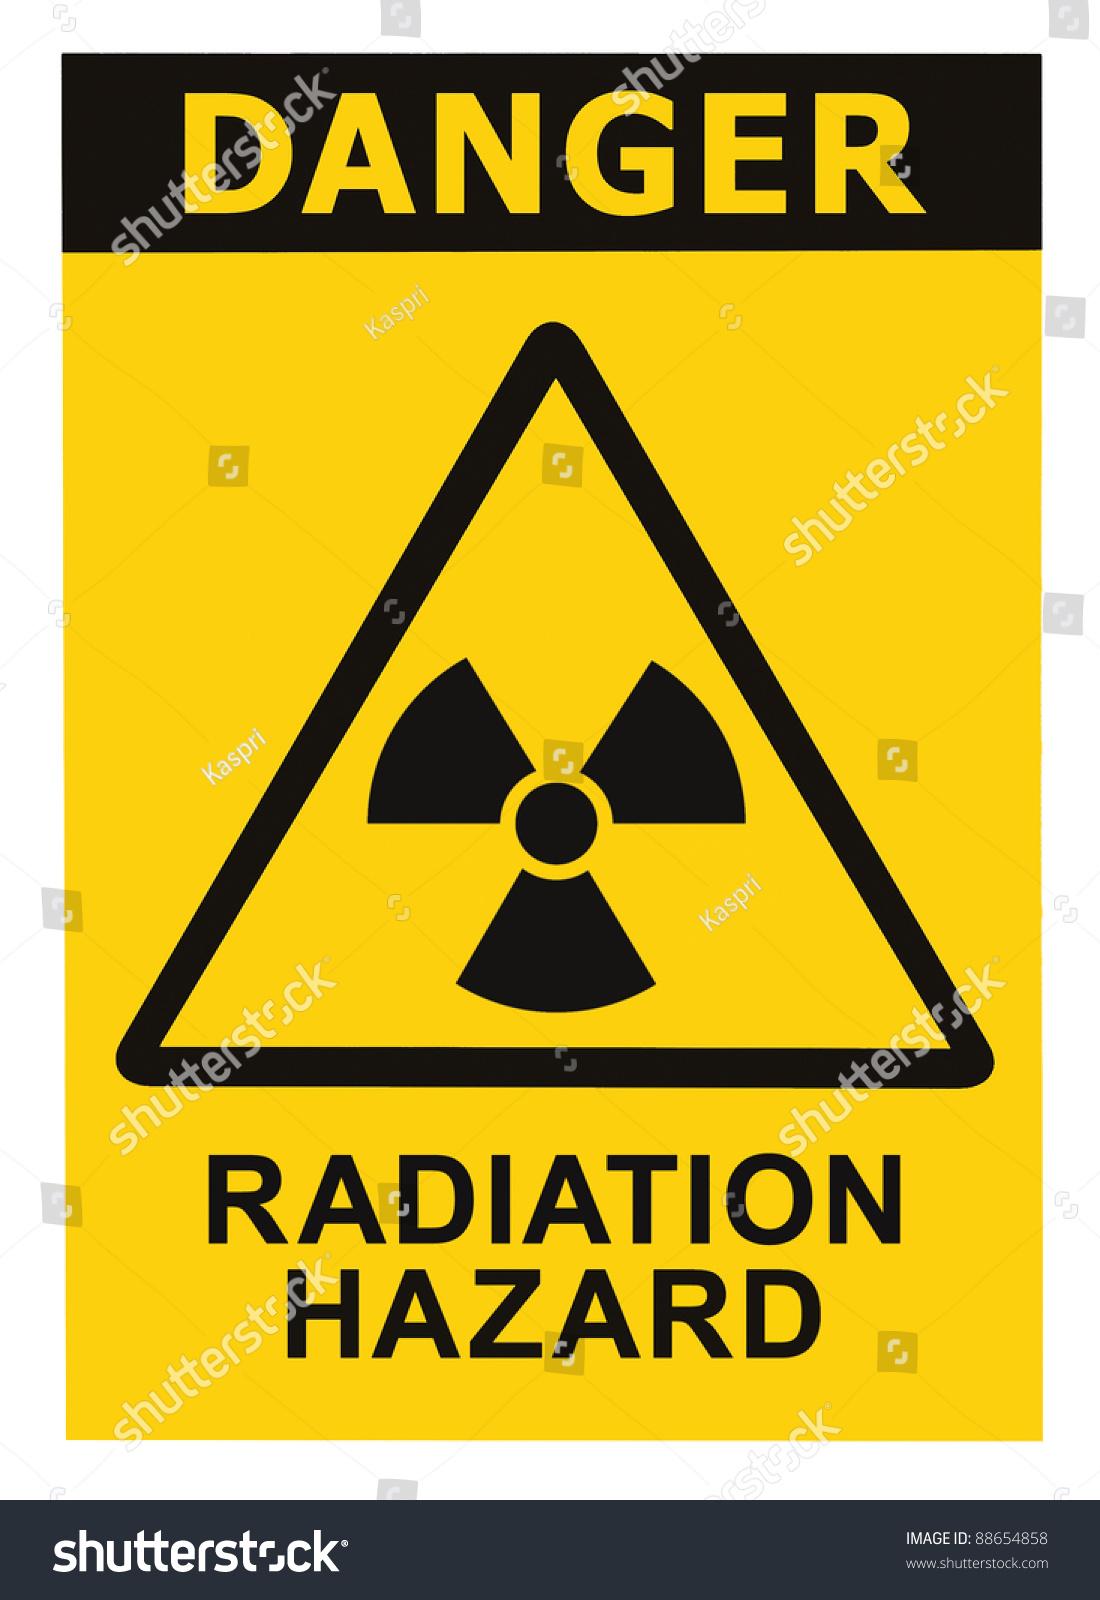 Symbols Hazard Symbol And Worksheets